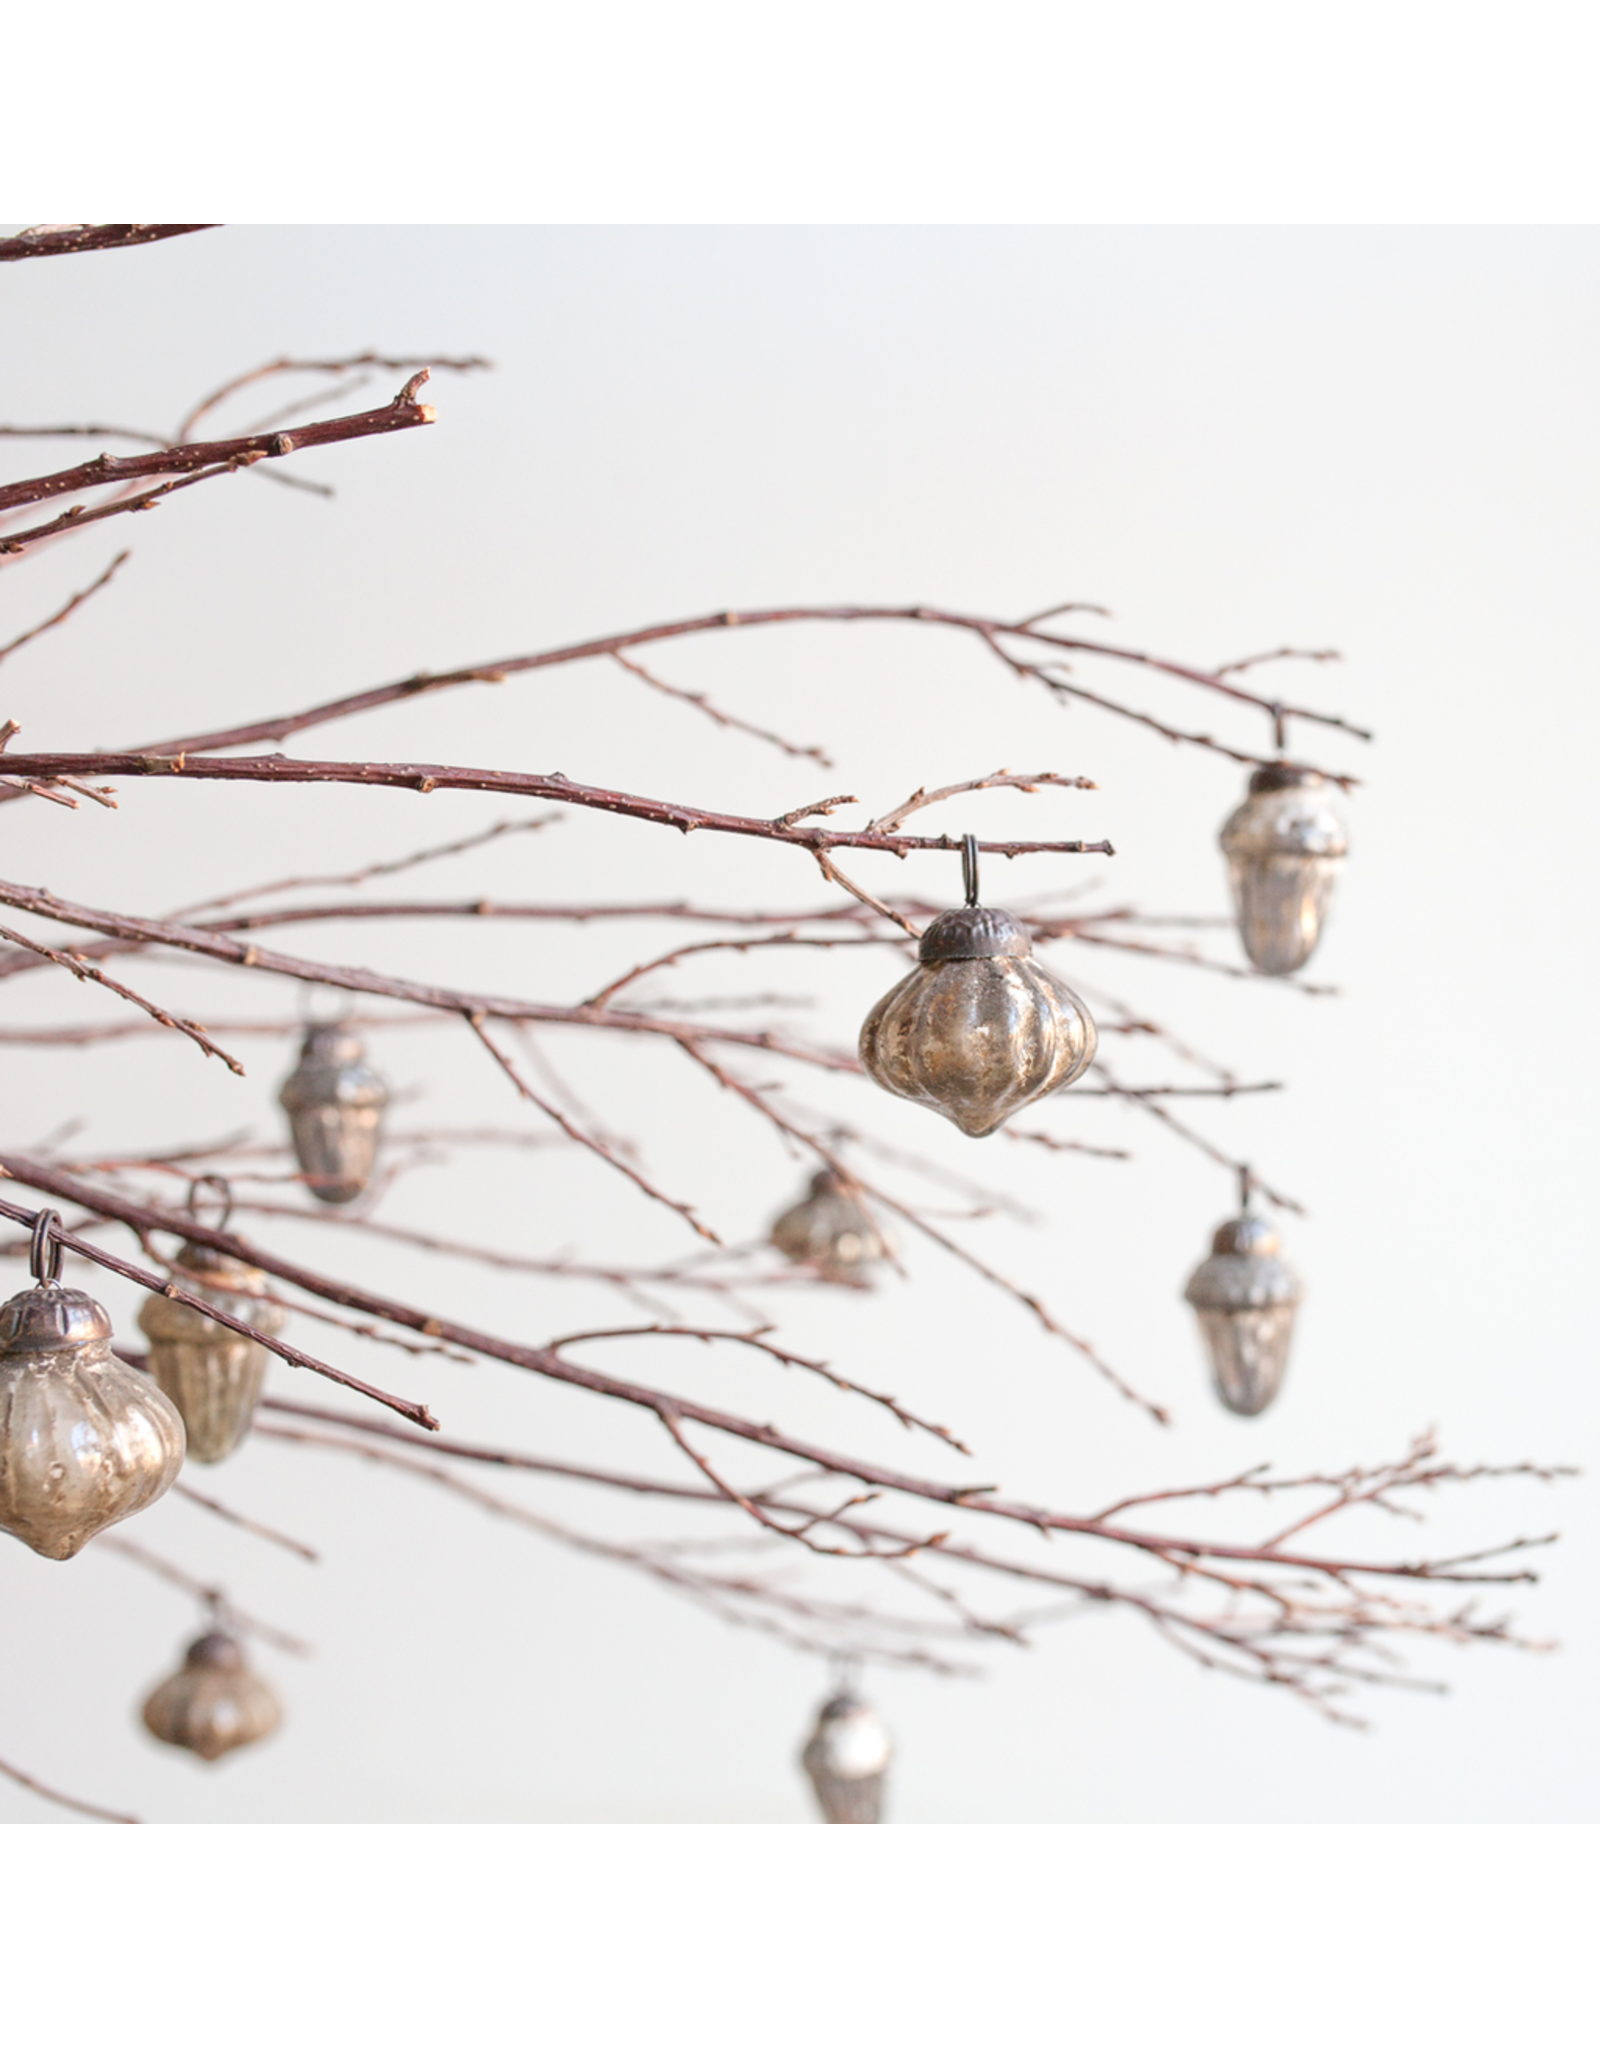 Mini Merury Glass Ornament